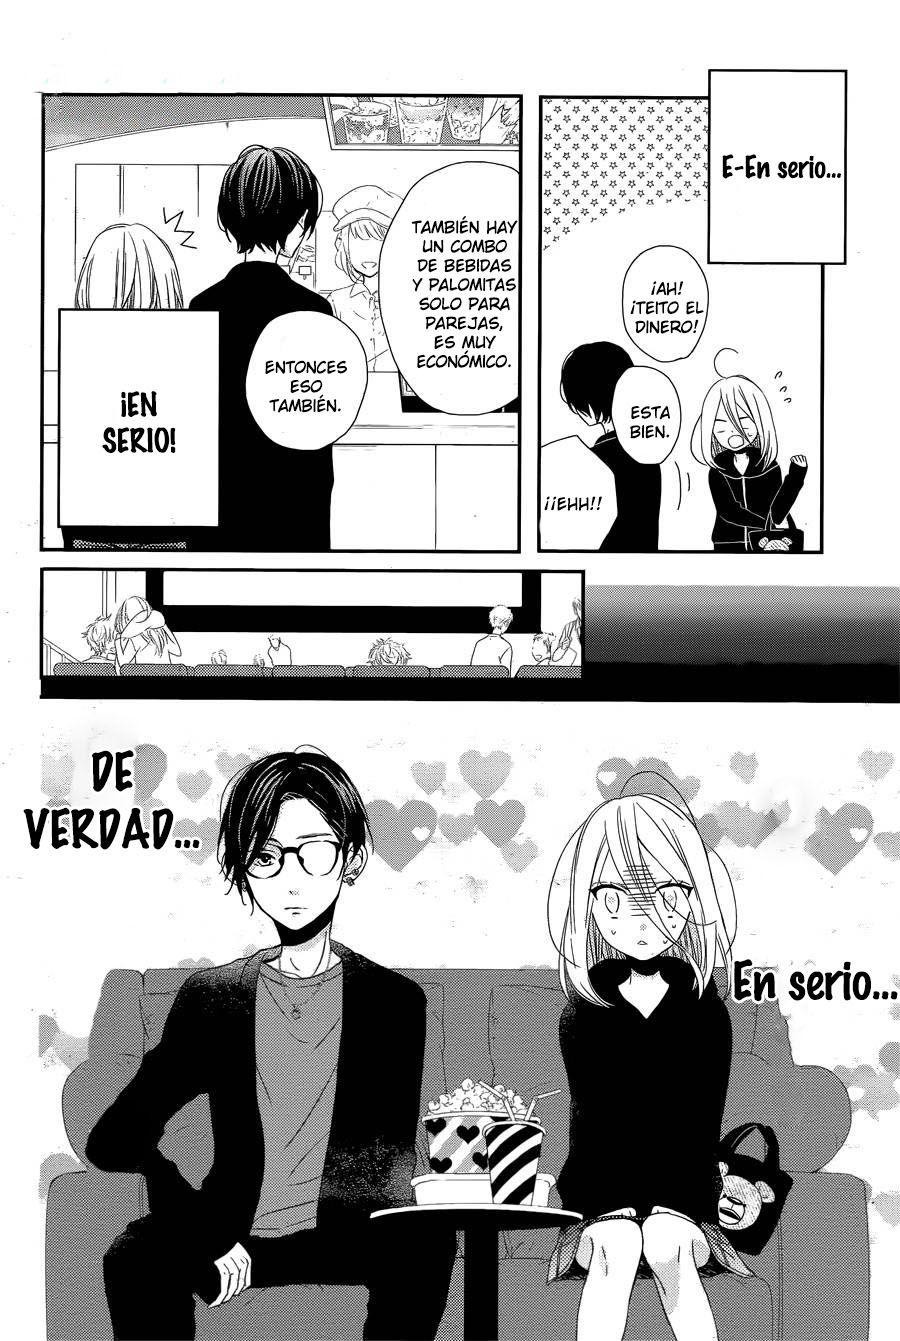 http://c5.ninemanga.com/es_manga/19/19347/473496/db27a2459bbd1a02bc74db649d9759bd.jpg Page 7